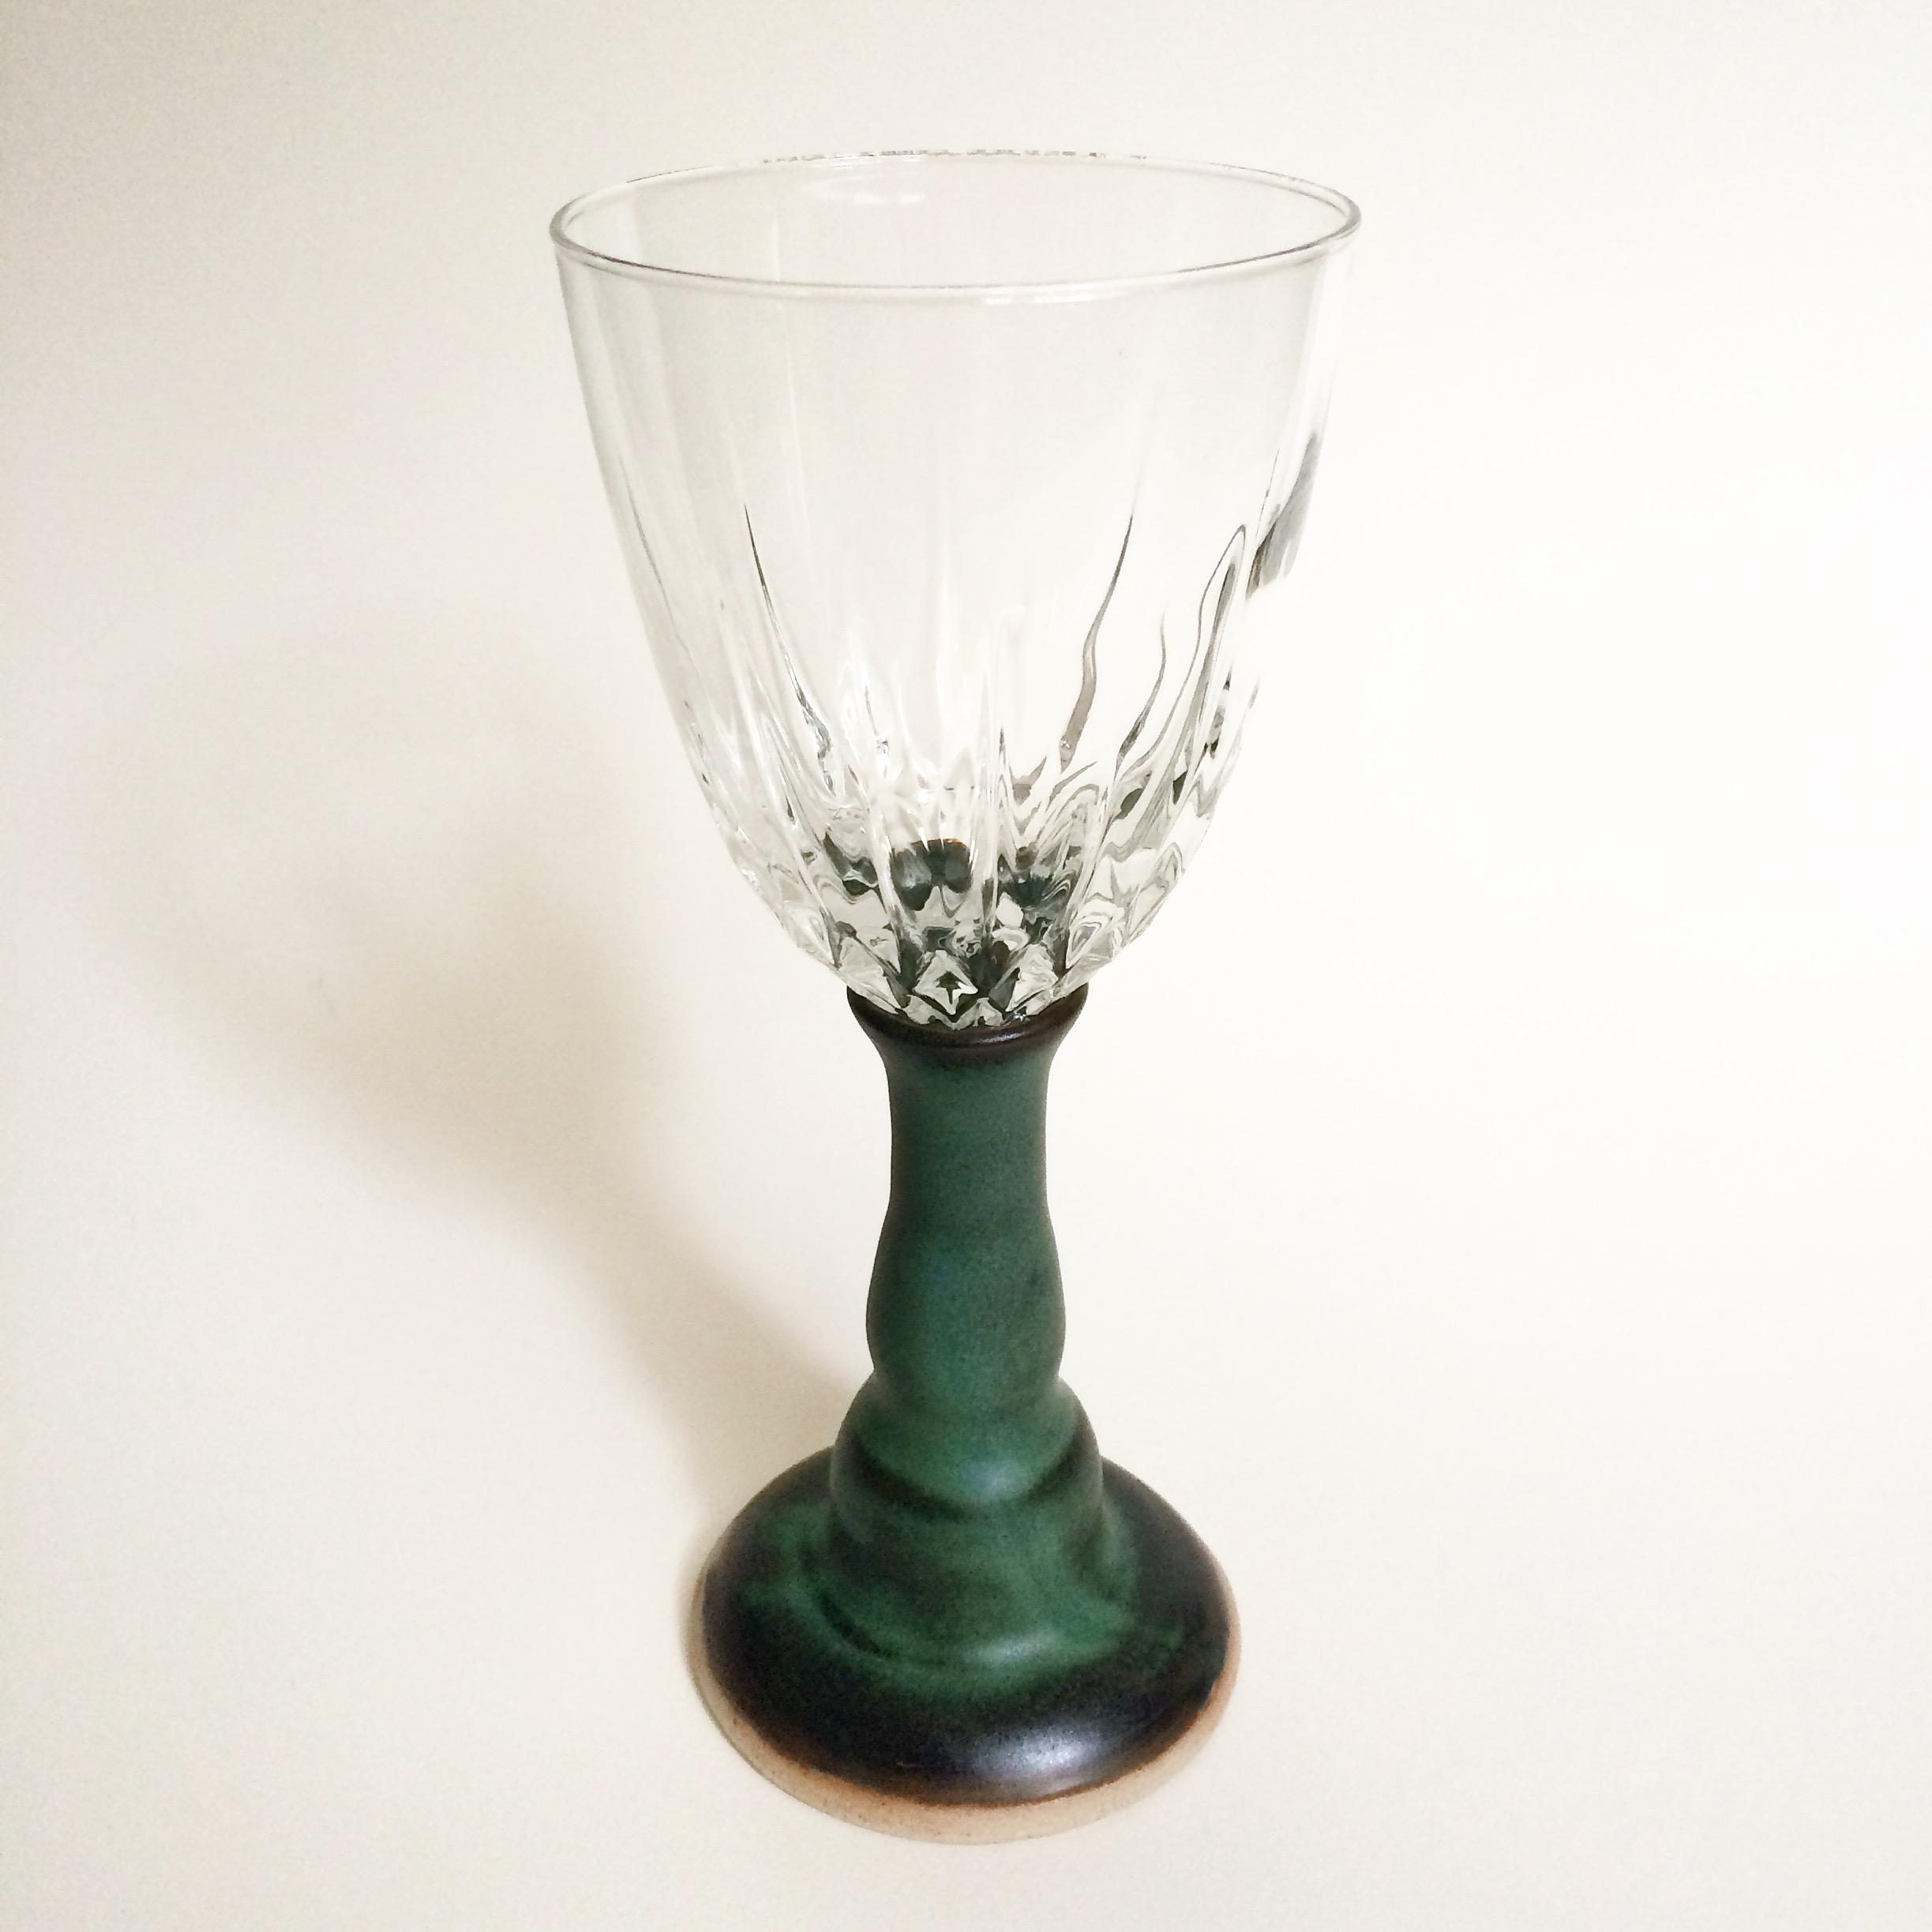 cramic stem wine glass.jpg